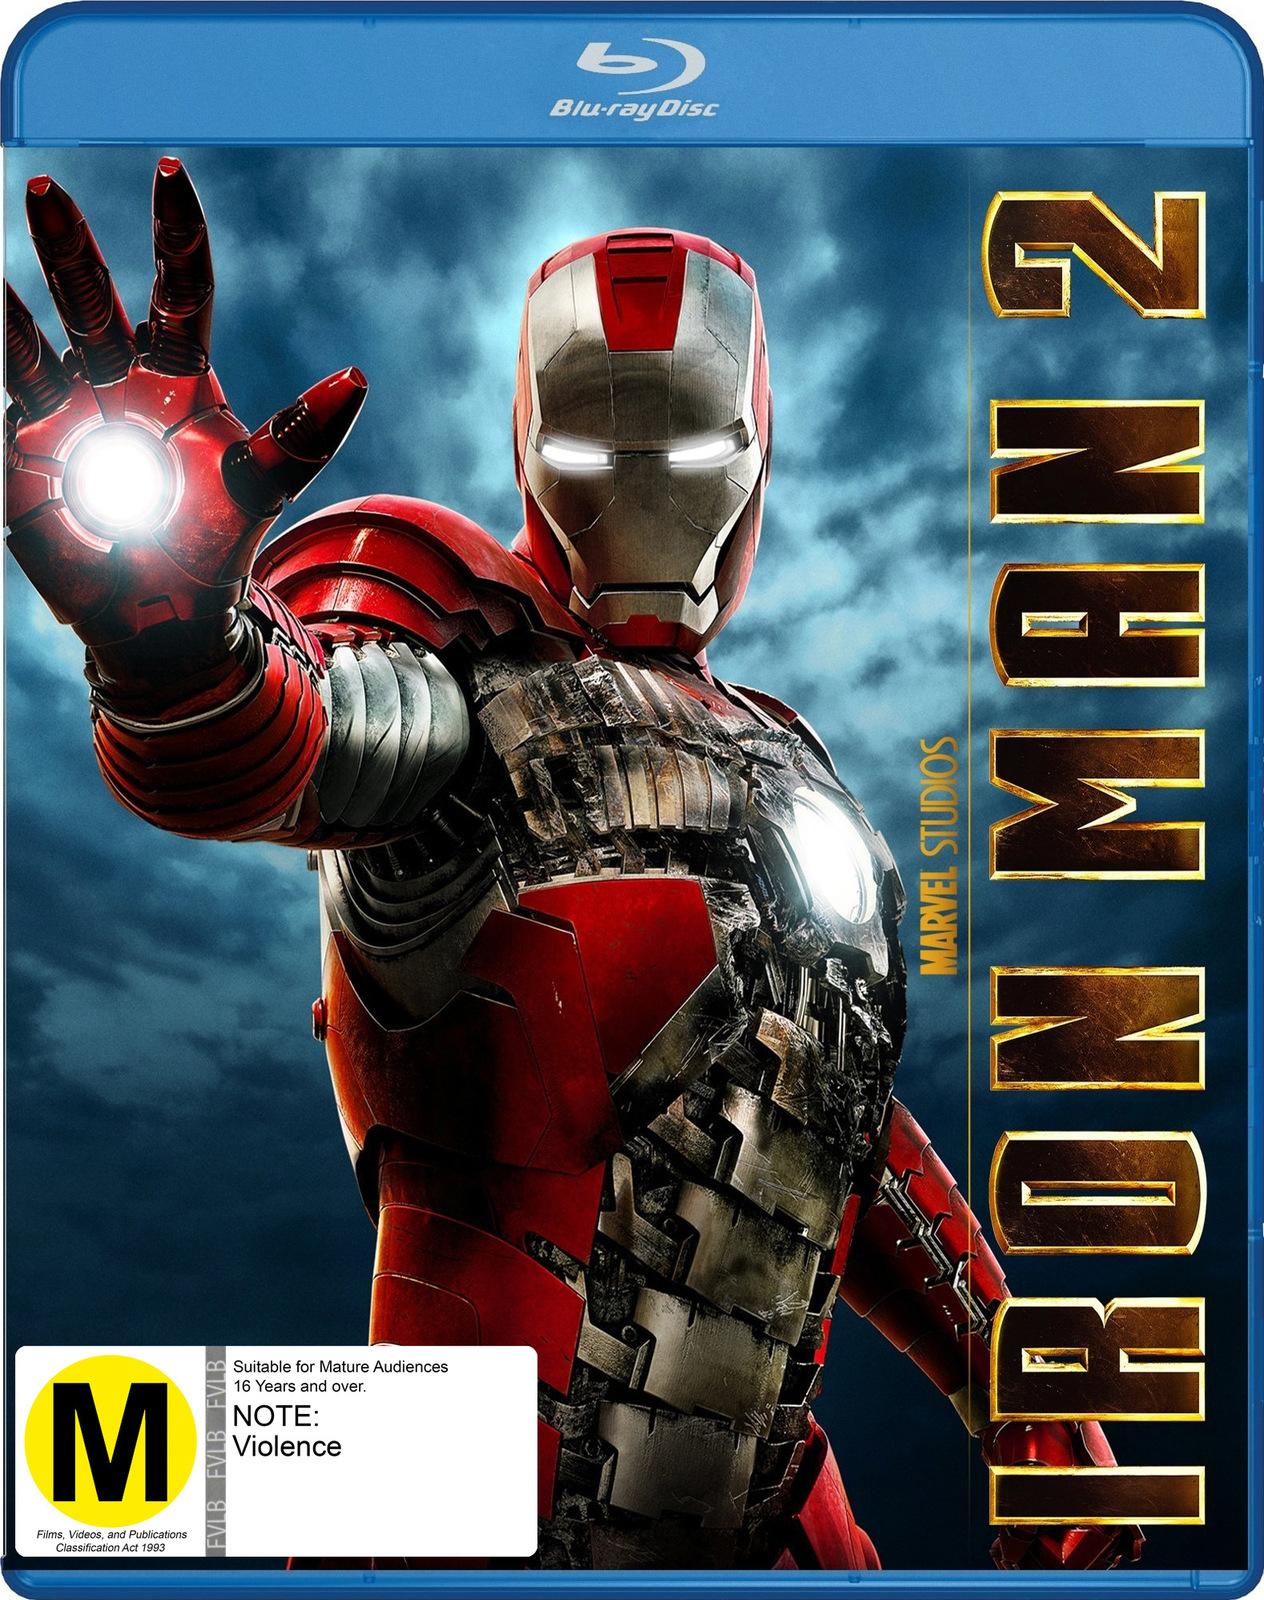 Iron Man 2 on Blu-ray image